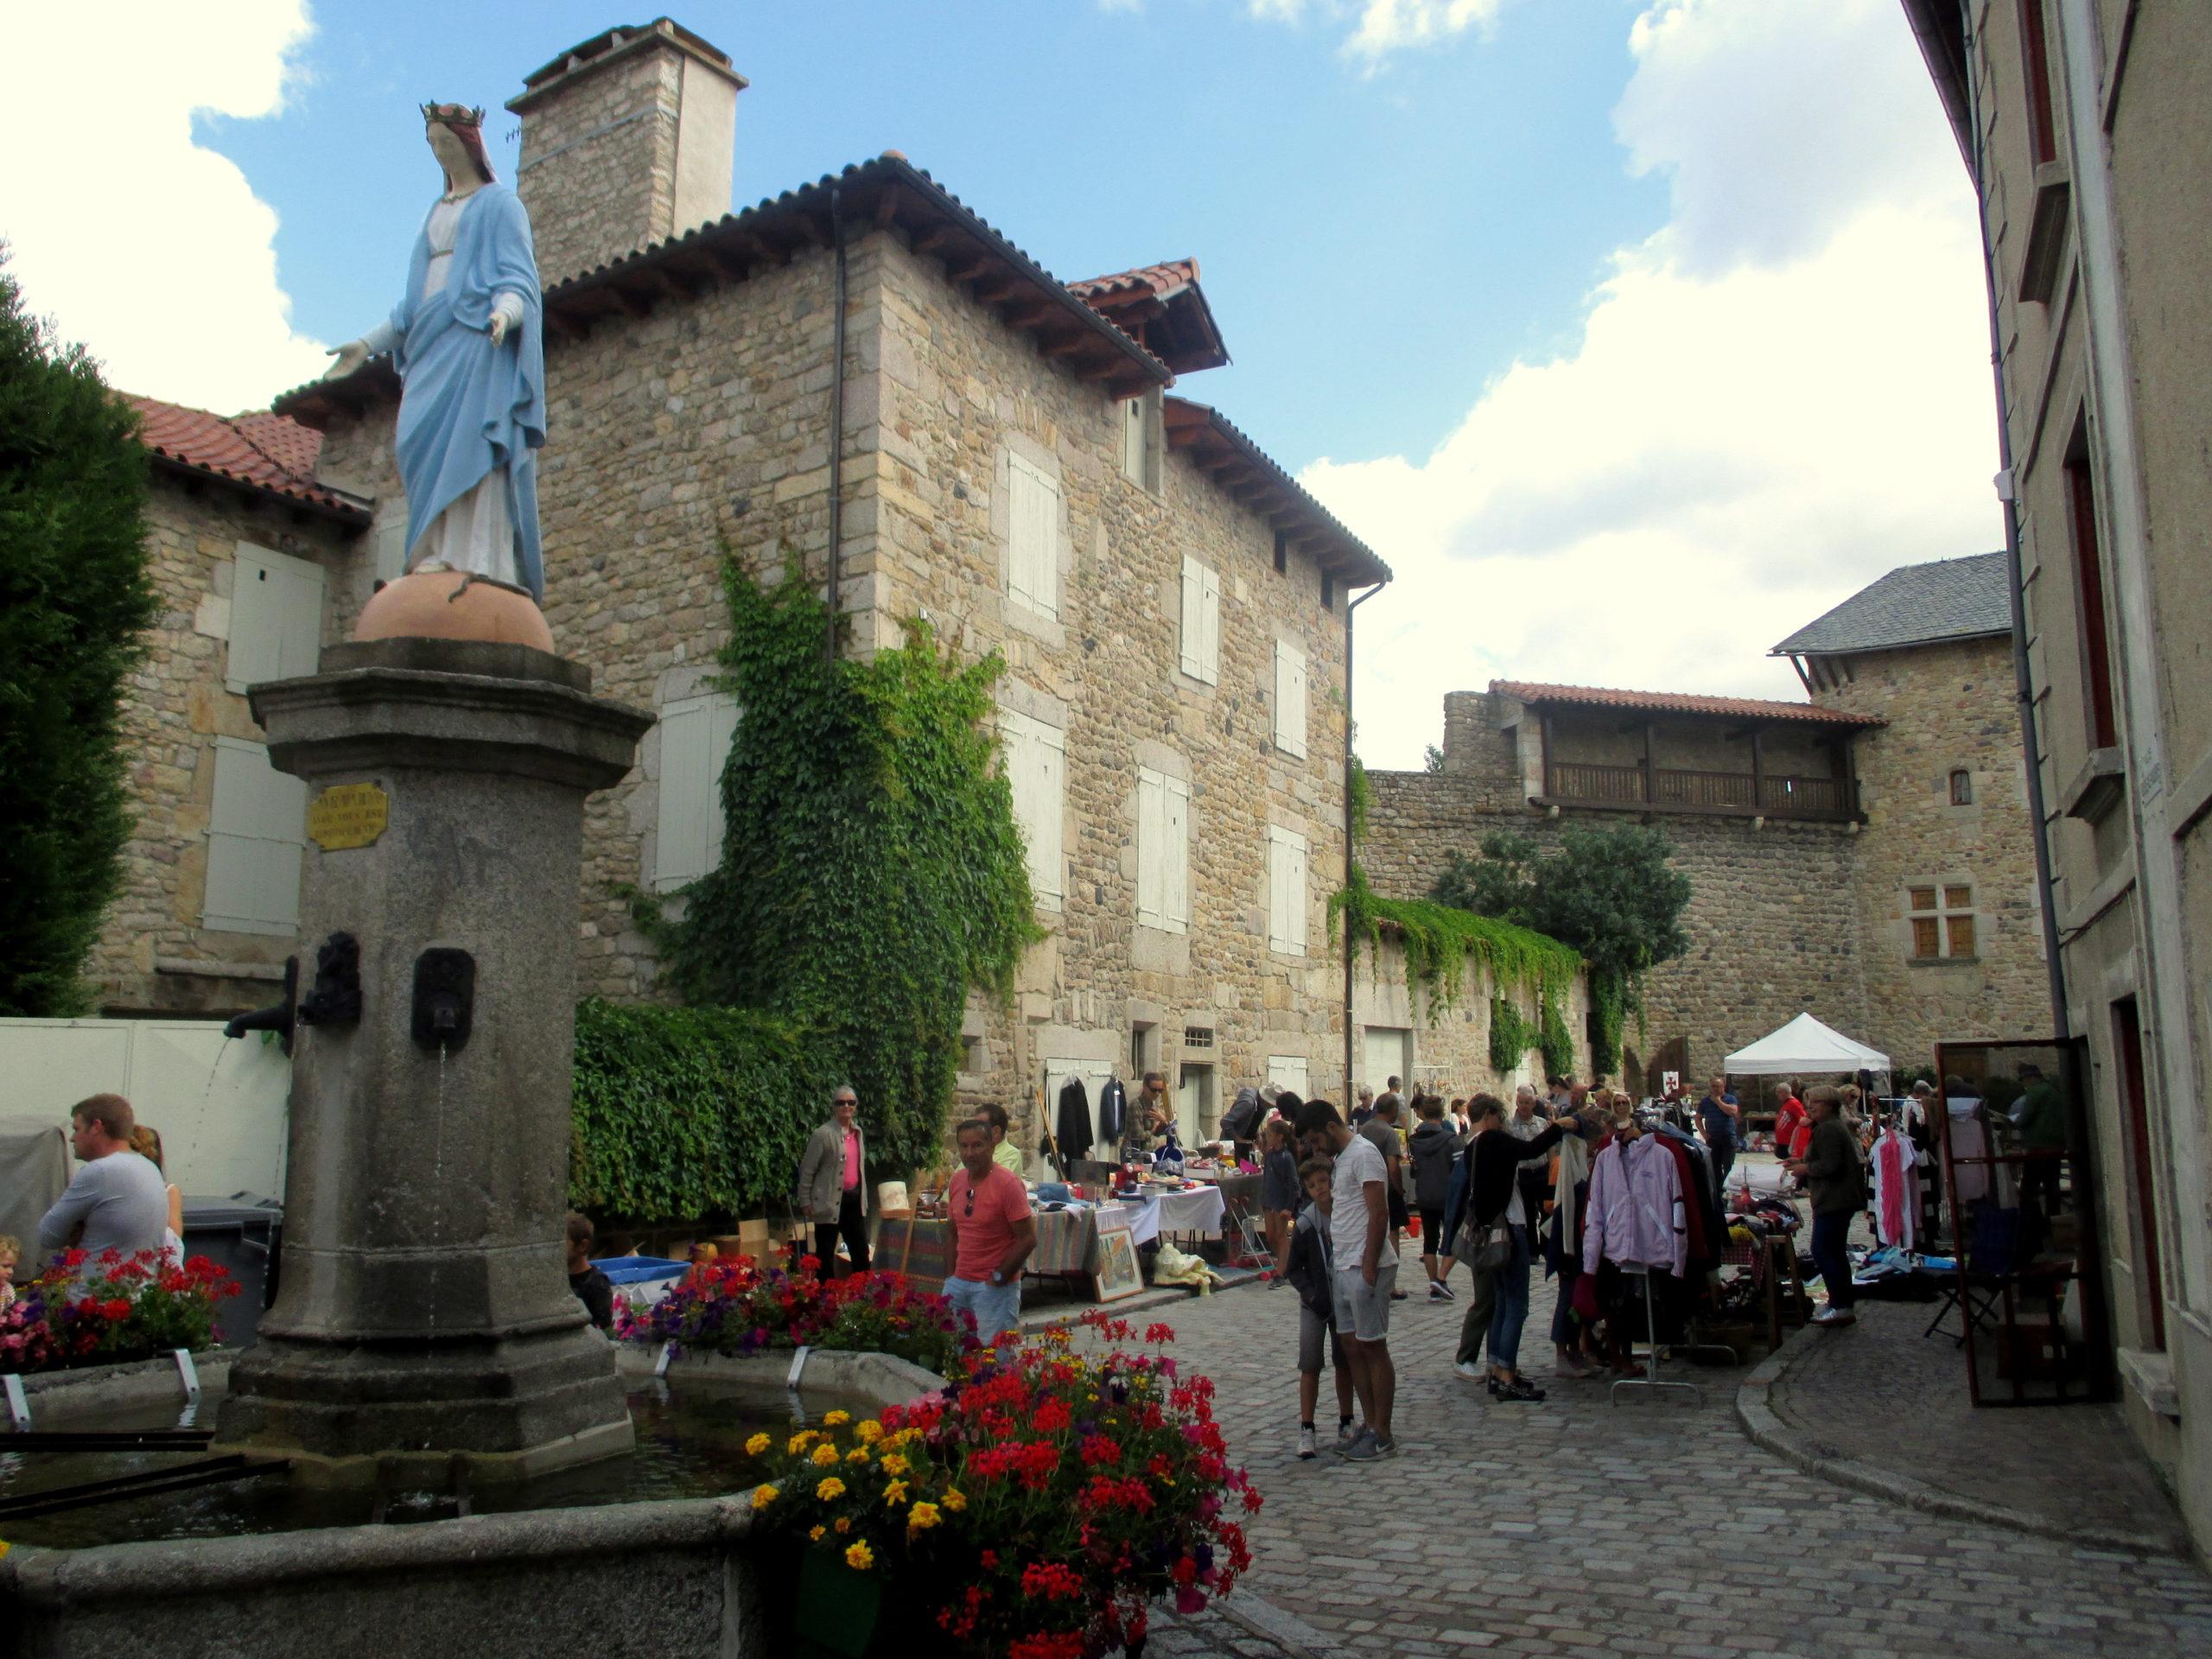 VIDE-GRENIER DU MALZIEU DU 14 JUILLET 2021-07-14 Le Malzieu-Ville